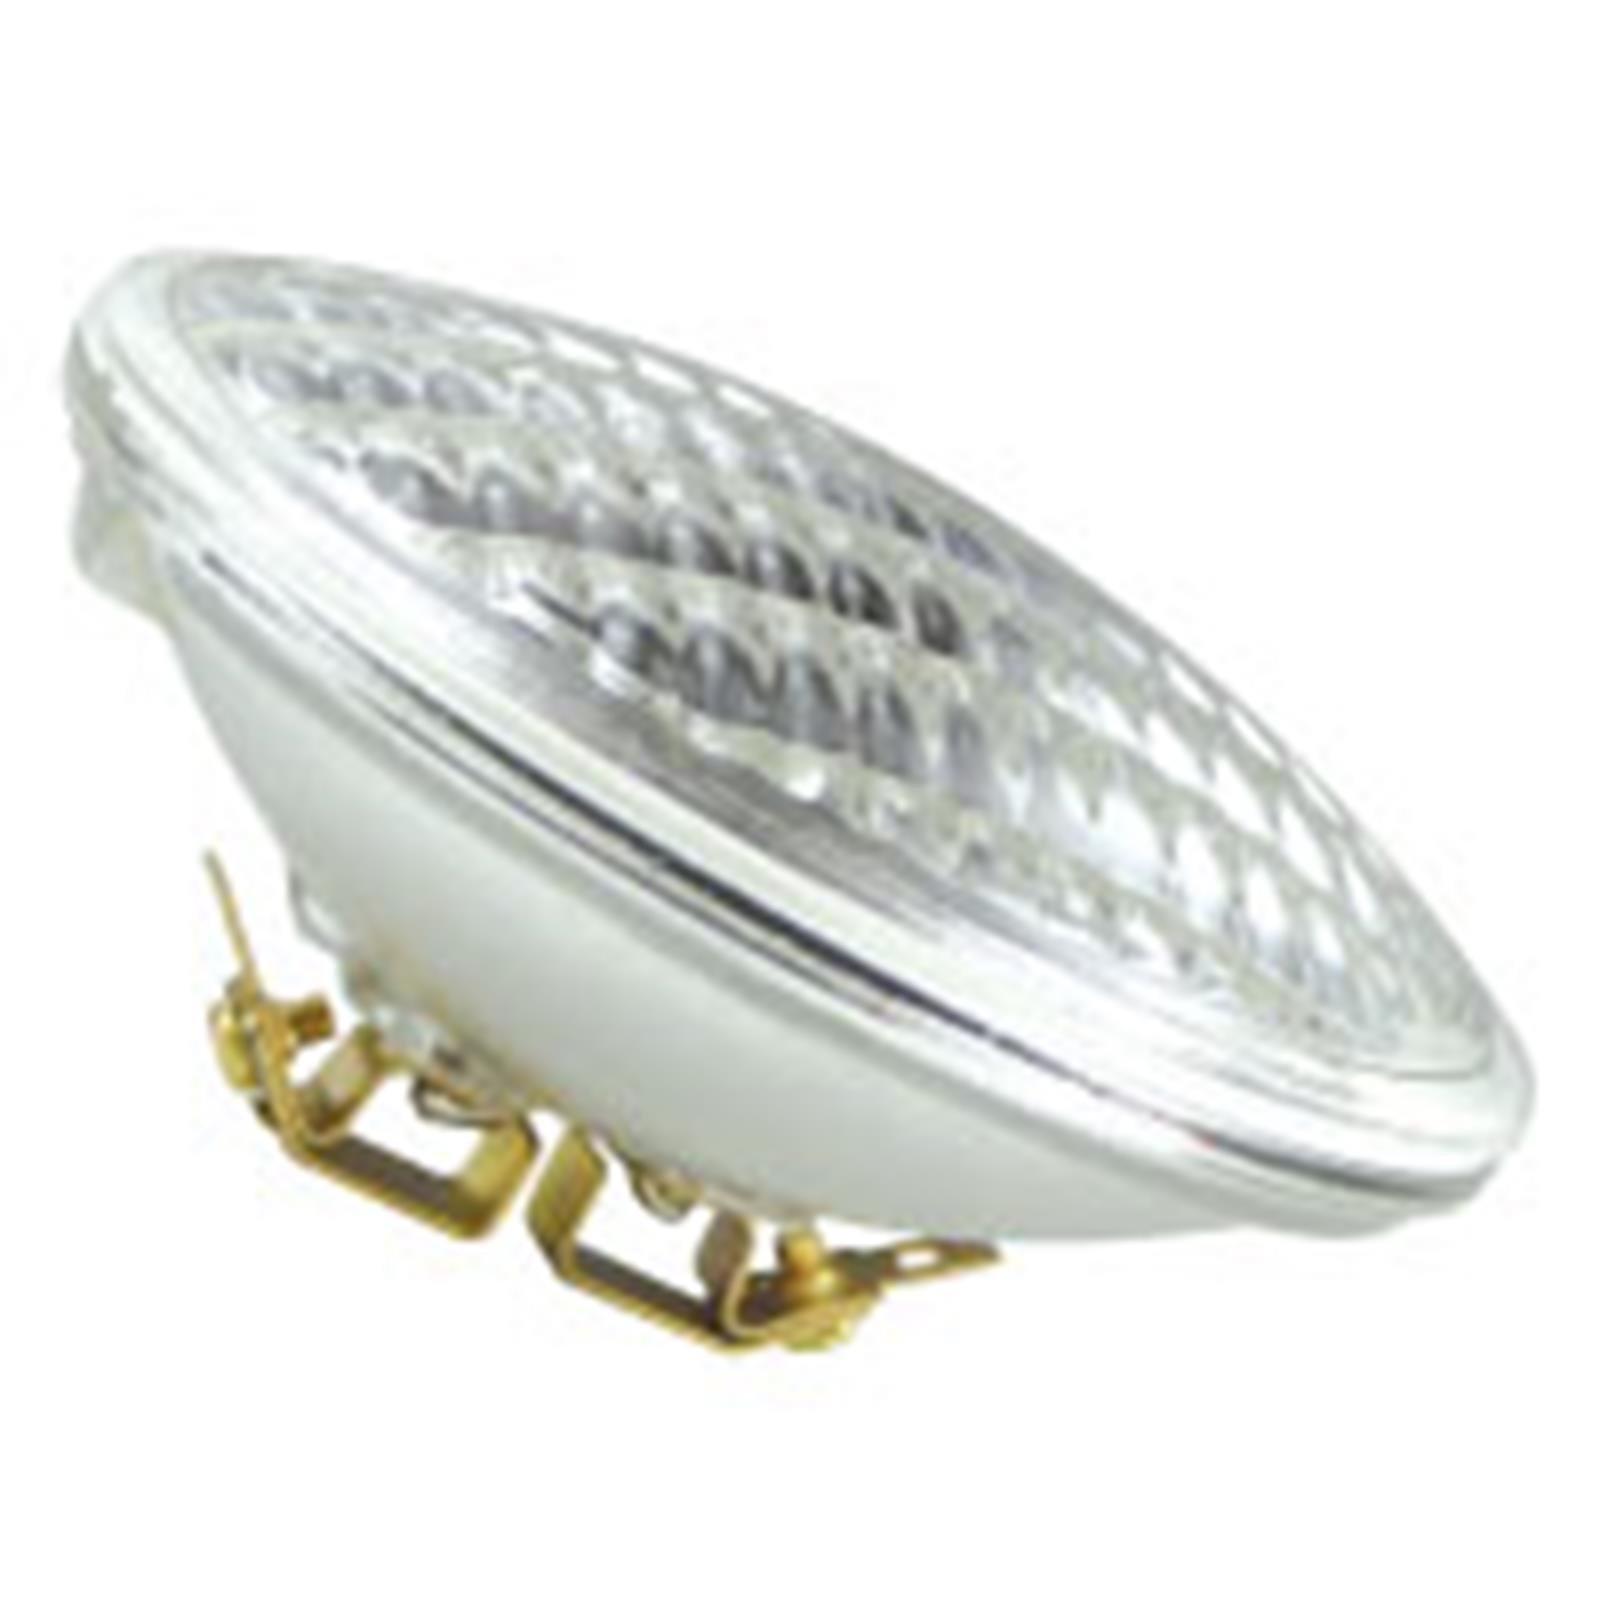 12 Qty. Halco 35W PAR36 WFL 24V MP-TERM Prism HP36WFL35/24V 35w 24v Incandescent Wide Flood Lamp Bulb